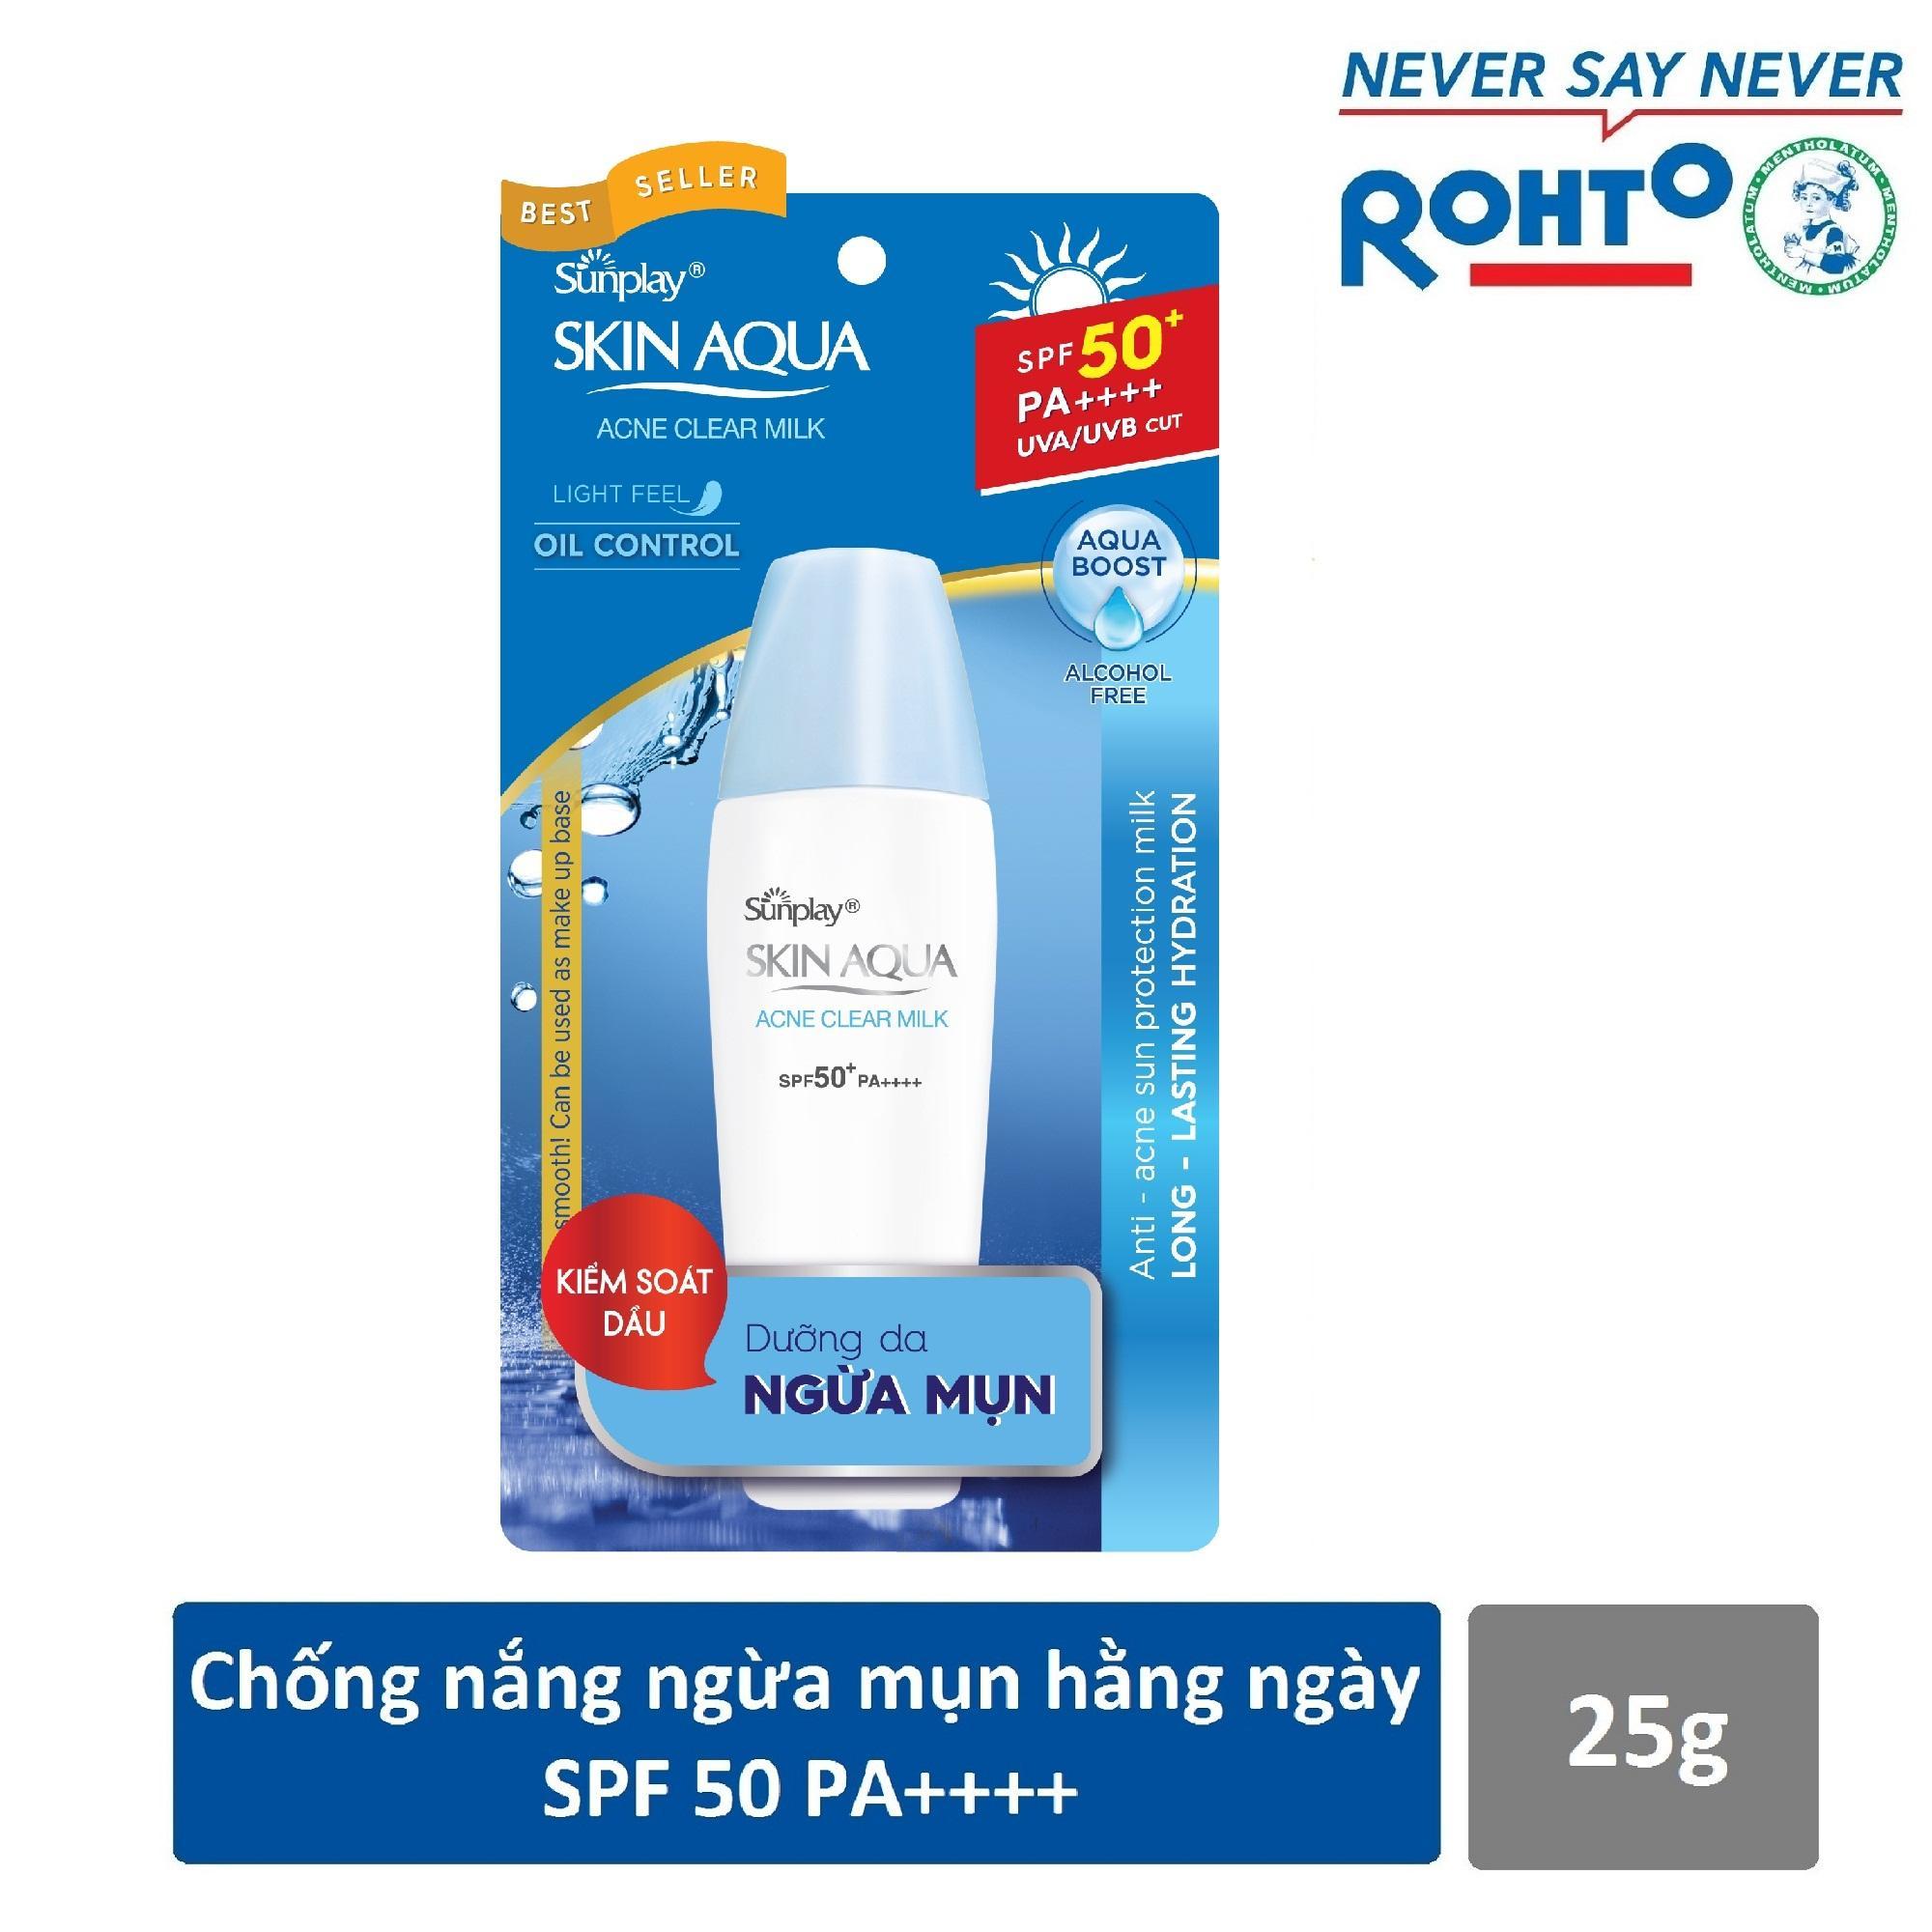 Sữa chống nắng dưỡng da ngừa mụn Sunplay Skin Aqua Acne Clear SPF 50+ PA++++ 25g